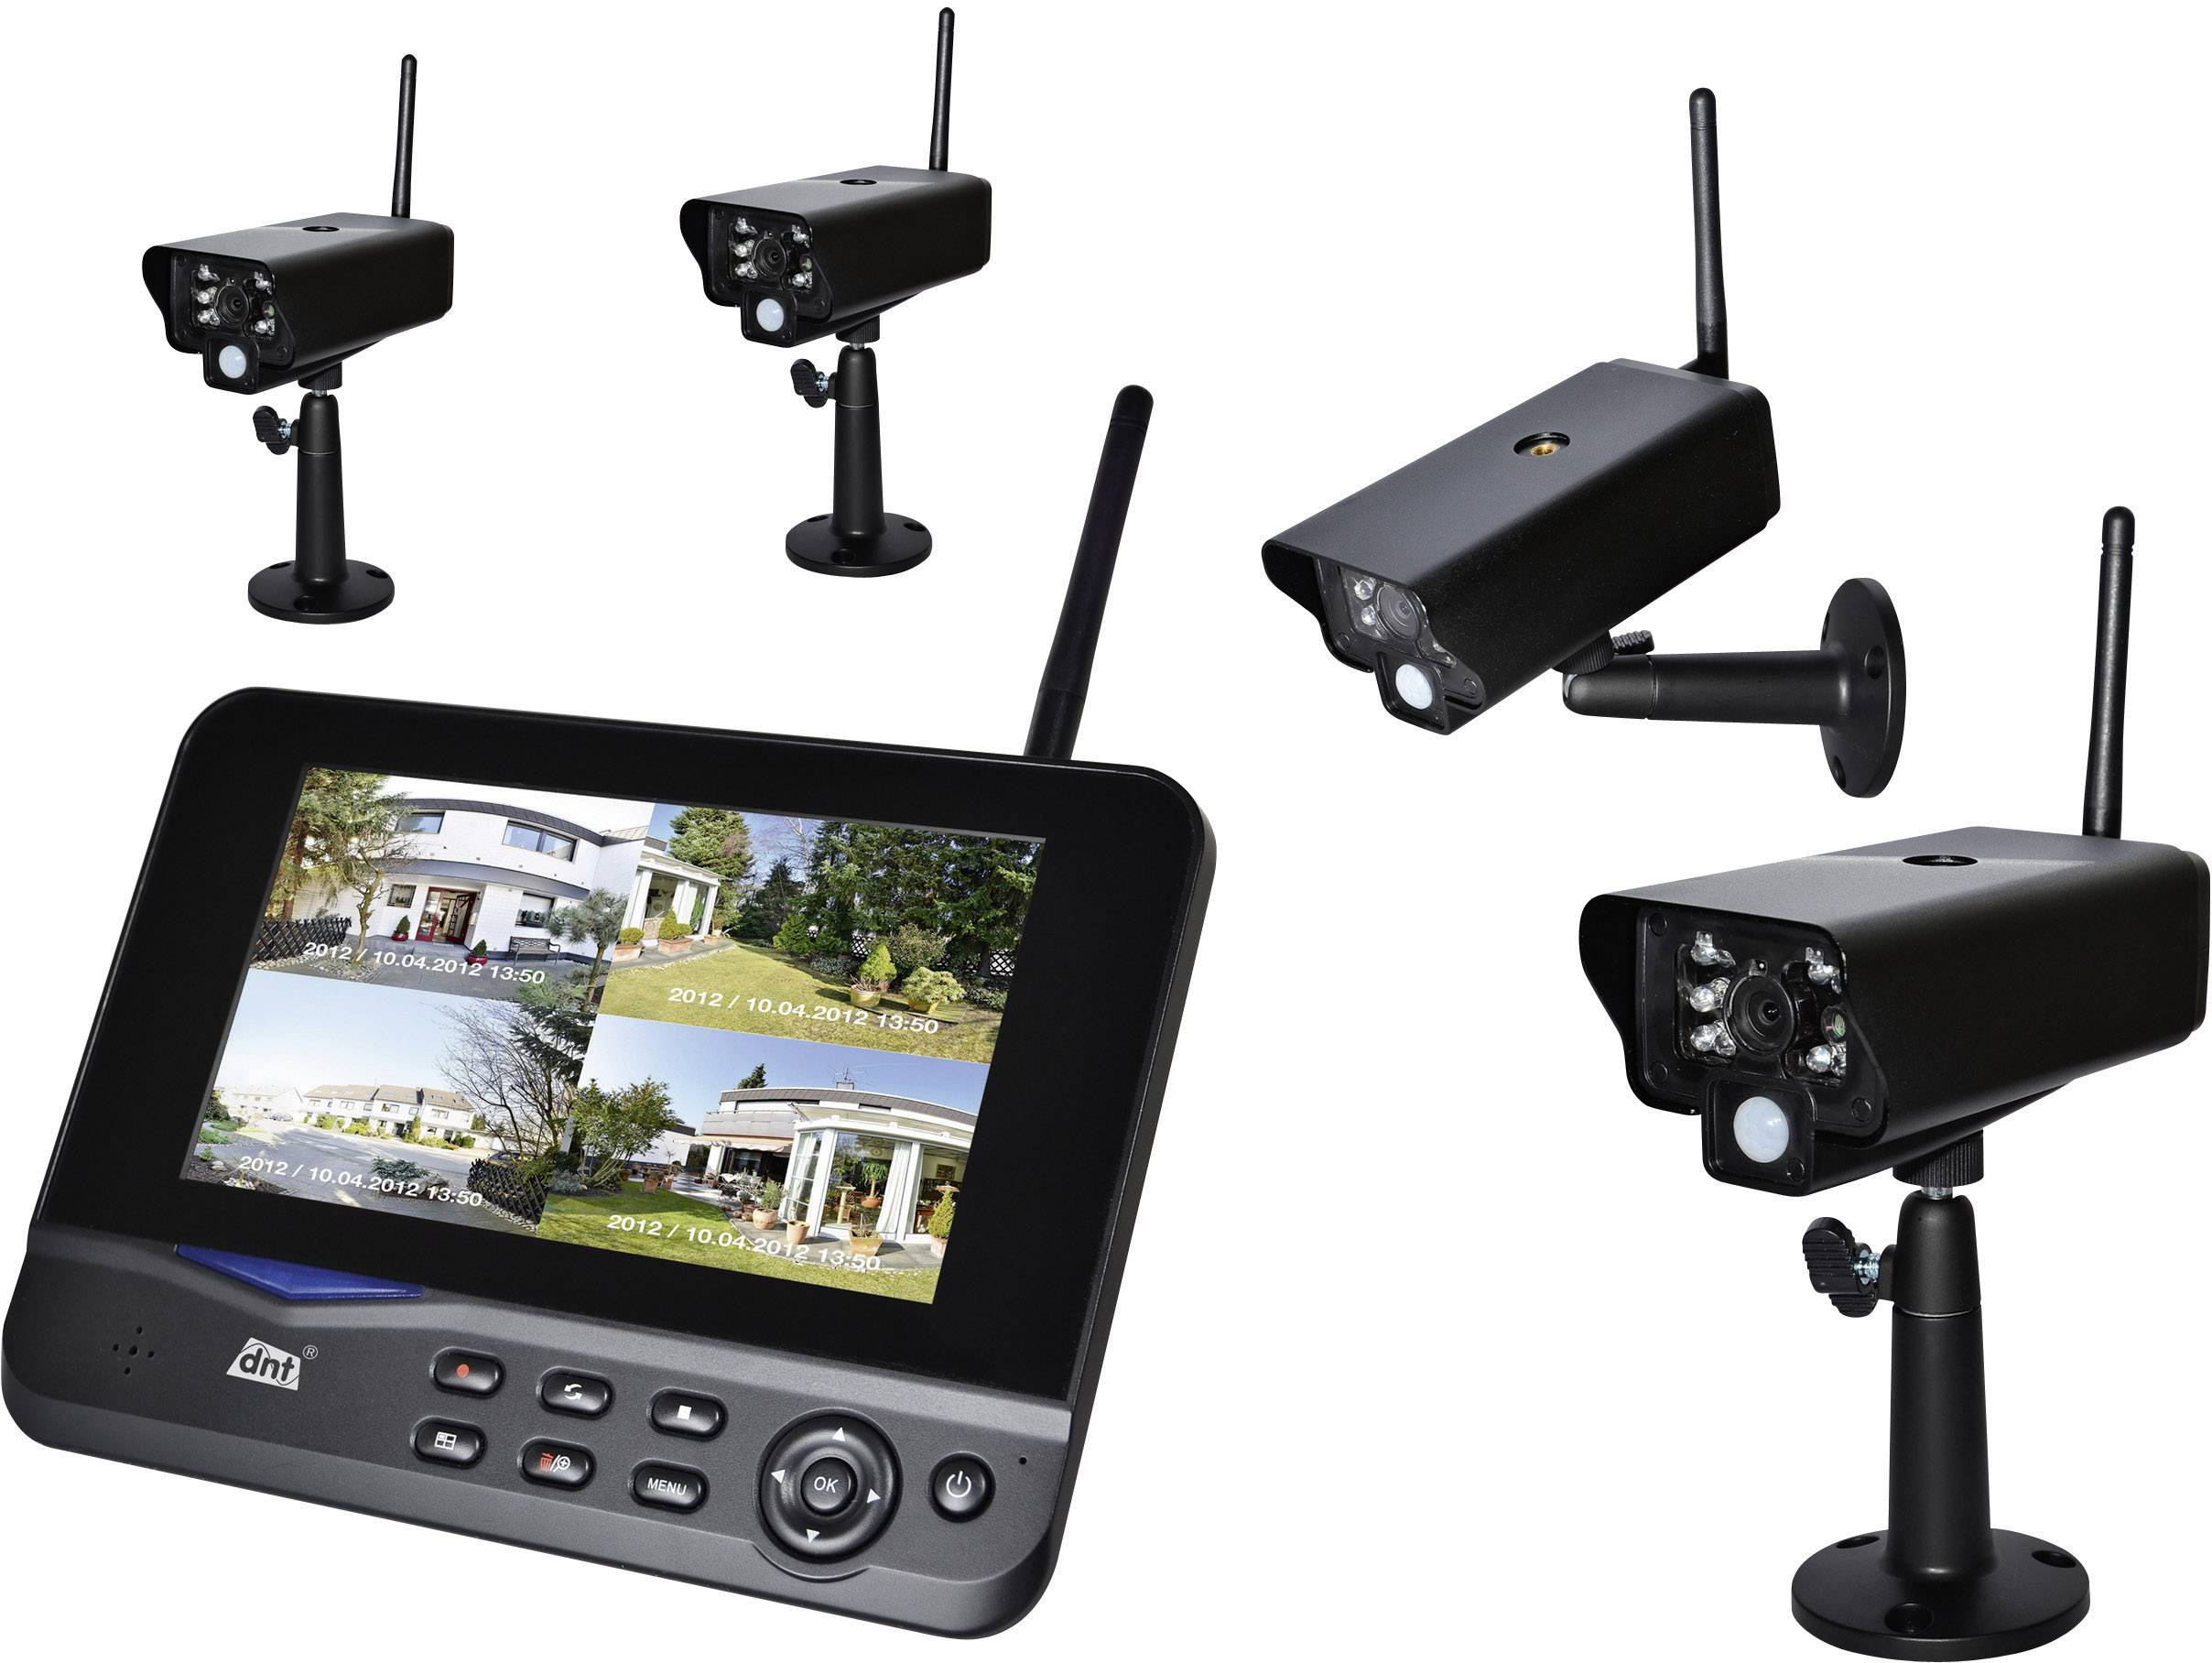 "Sada bezdrátových kamer s monitorem 7"" dnt Quattsecure Profiset, 52201, 2,4 GHz, 4 ks"